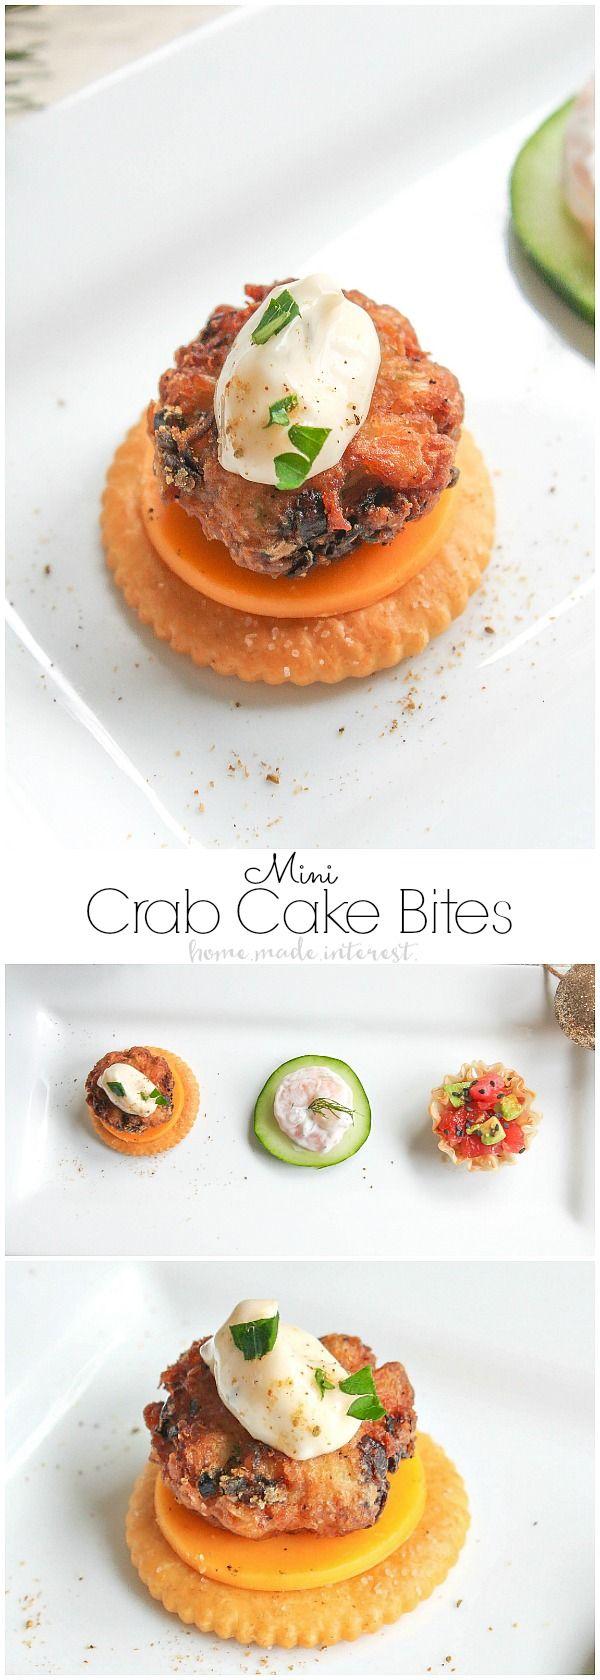 Sip and bite crab cake recipe